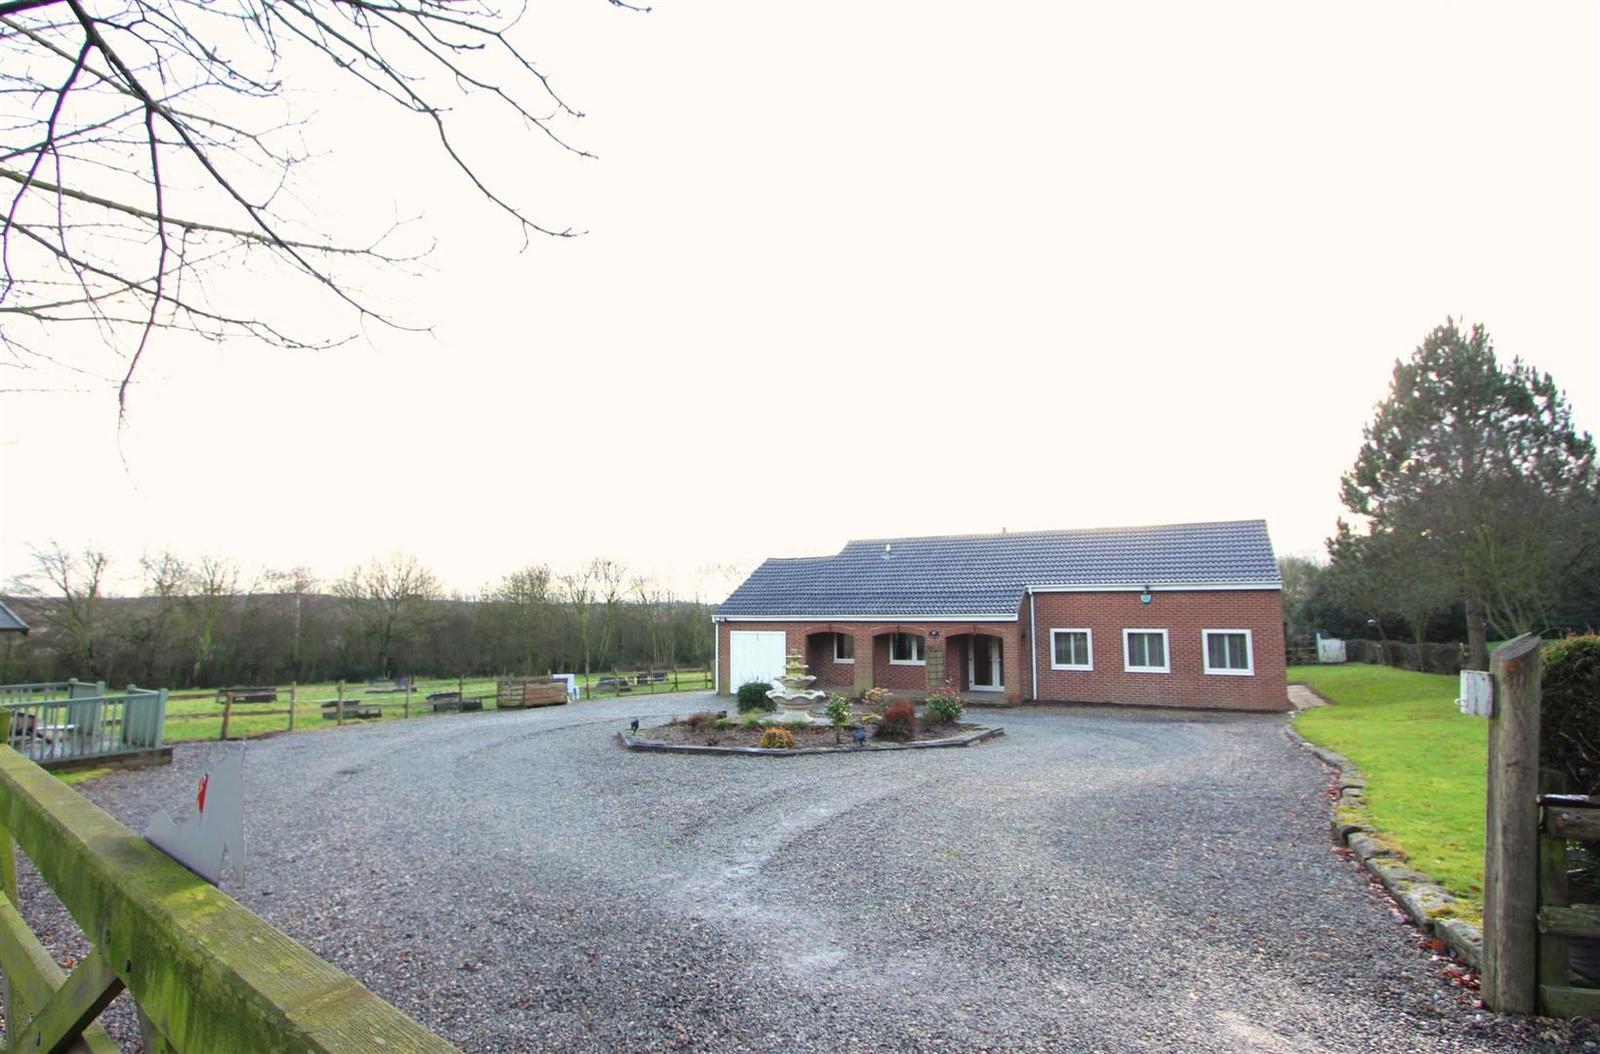 4 Bedrooms Property for sale in Hall Lane, Donisthorpe, DE12 7PZ